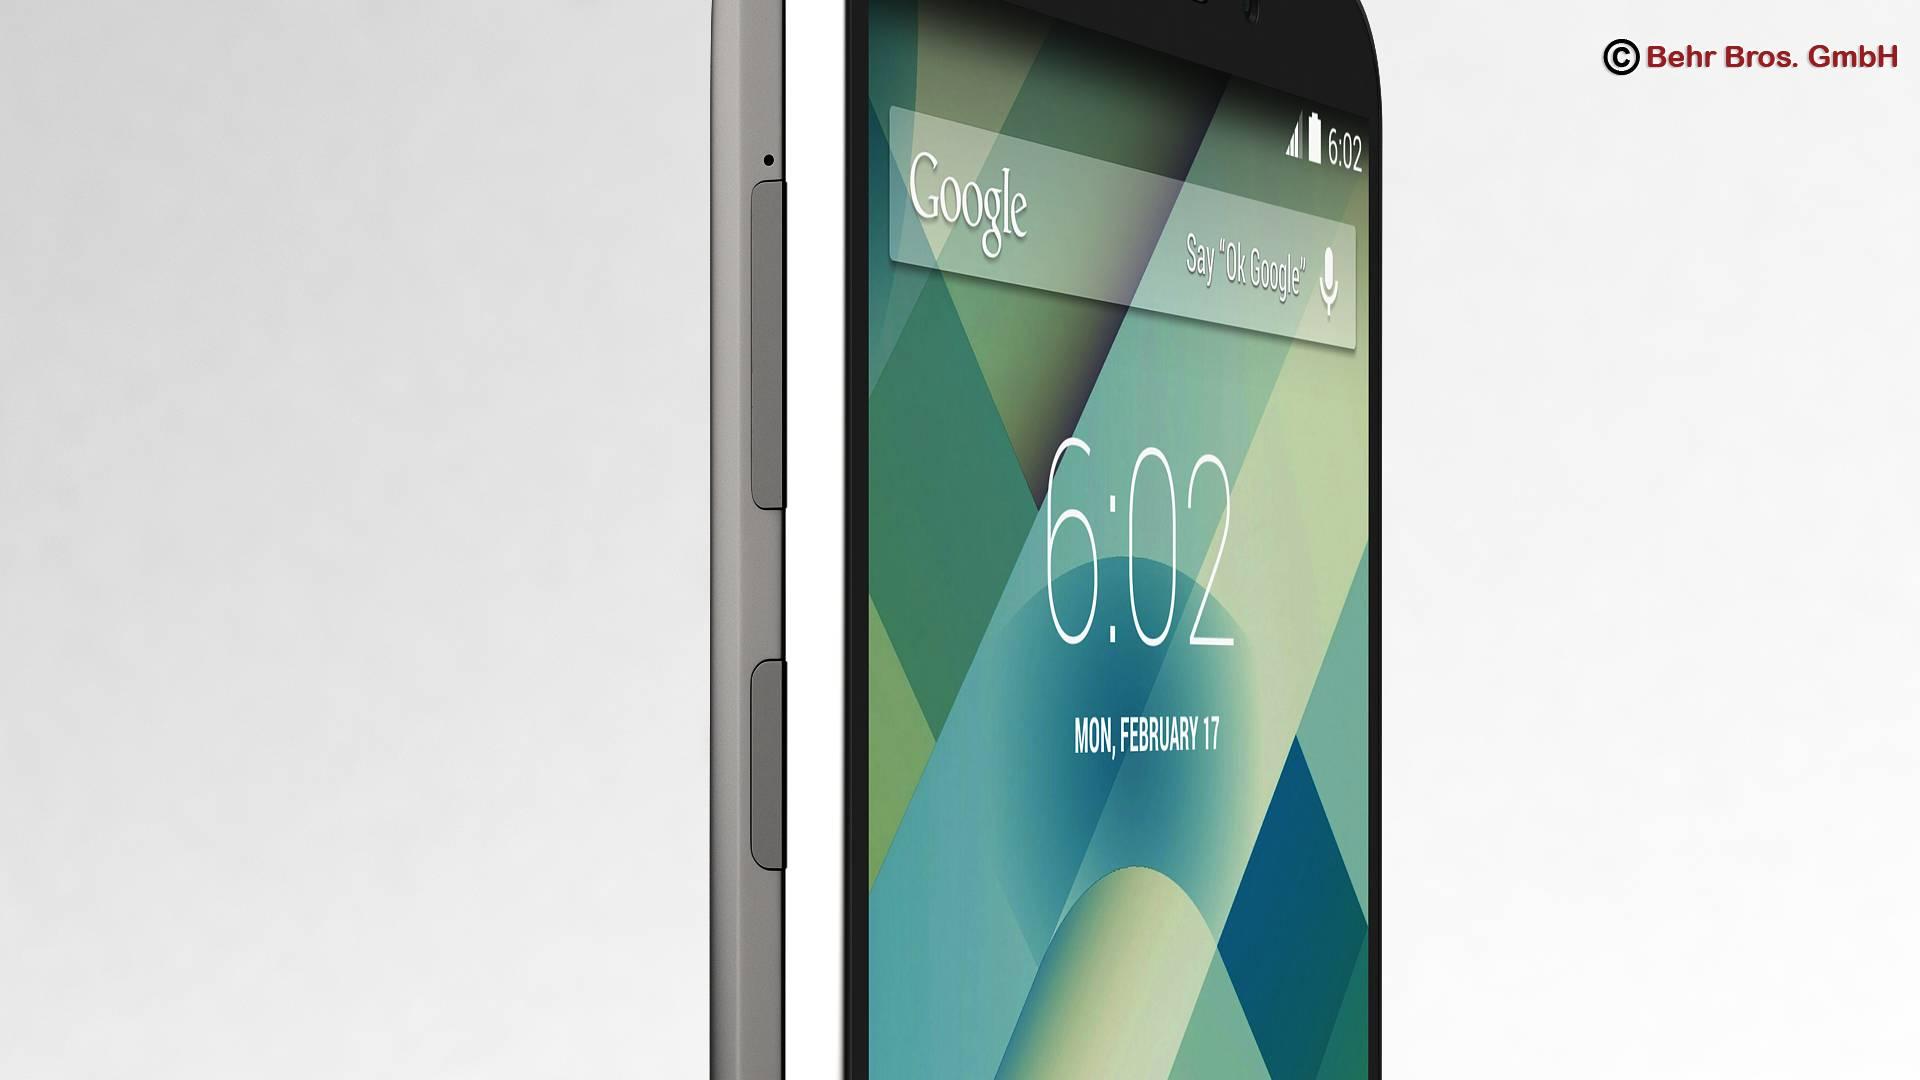 generic smartphone 5.2 inch 3d model 3ds max fbx c4d lwo ma mb obj 161651